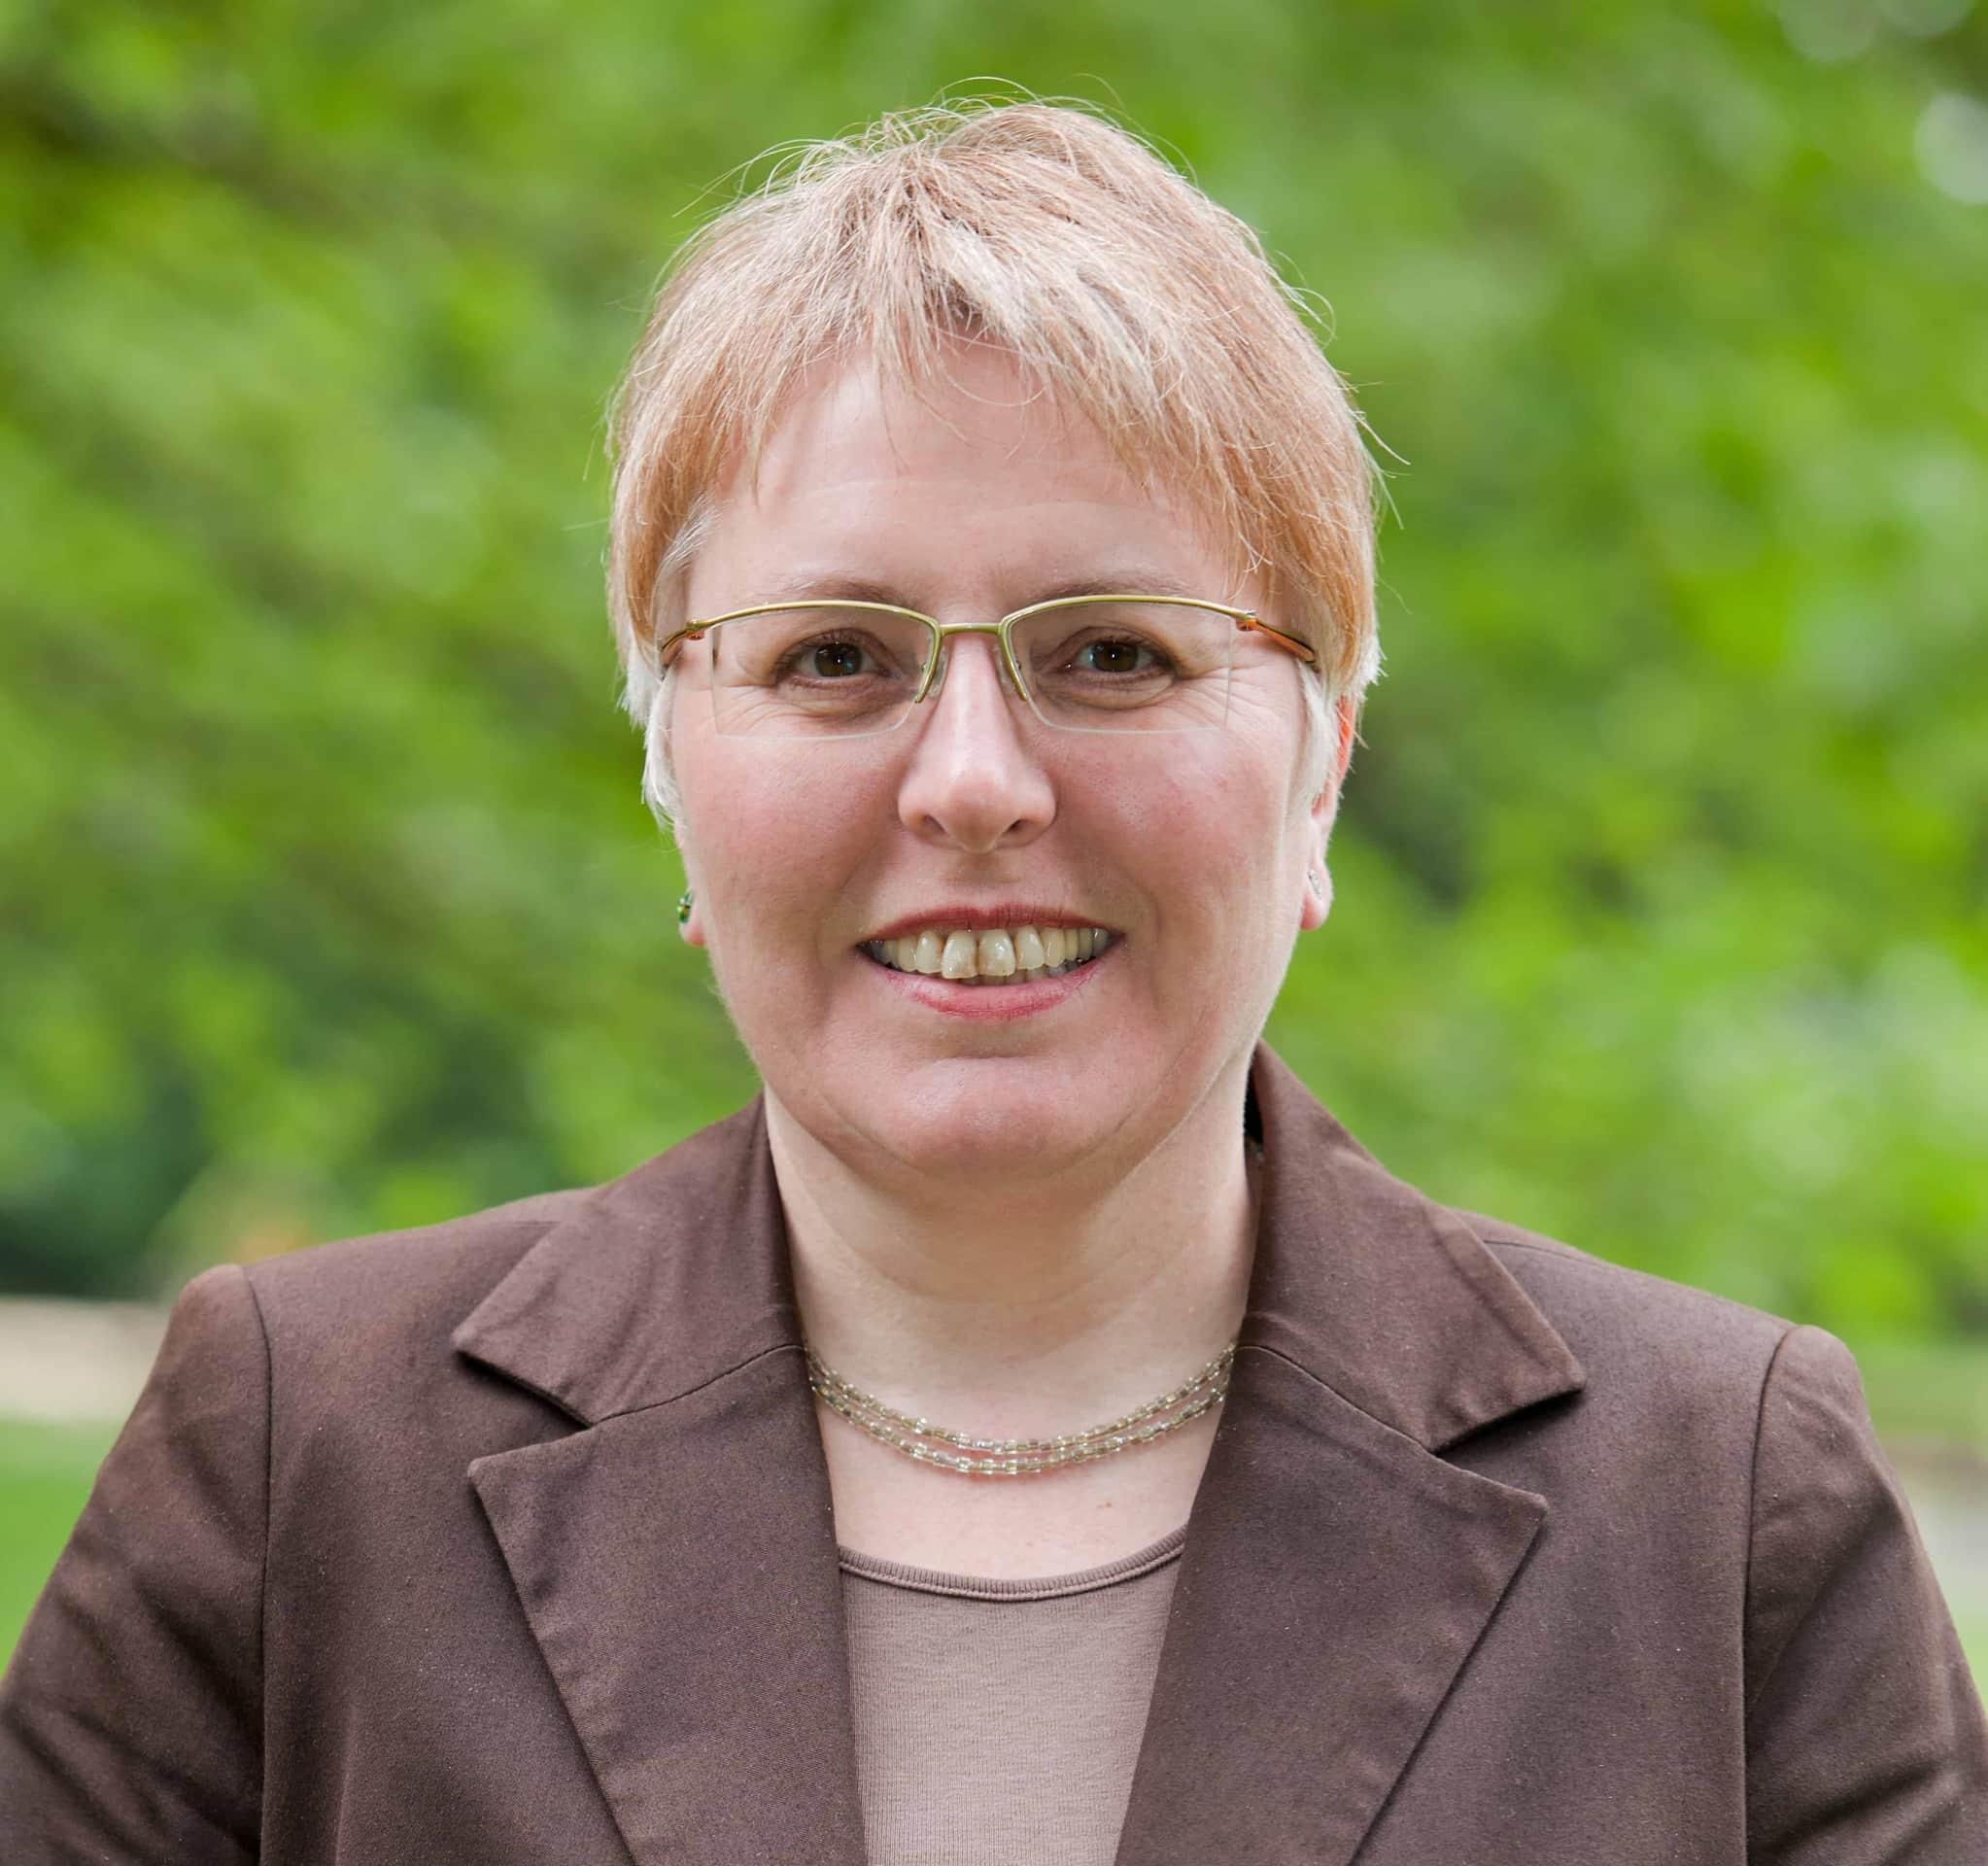 Regensburger Grüne fordern Stärkung des ÖPNV und mehr Grünflächen